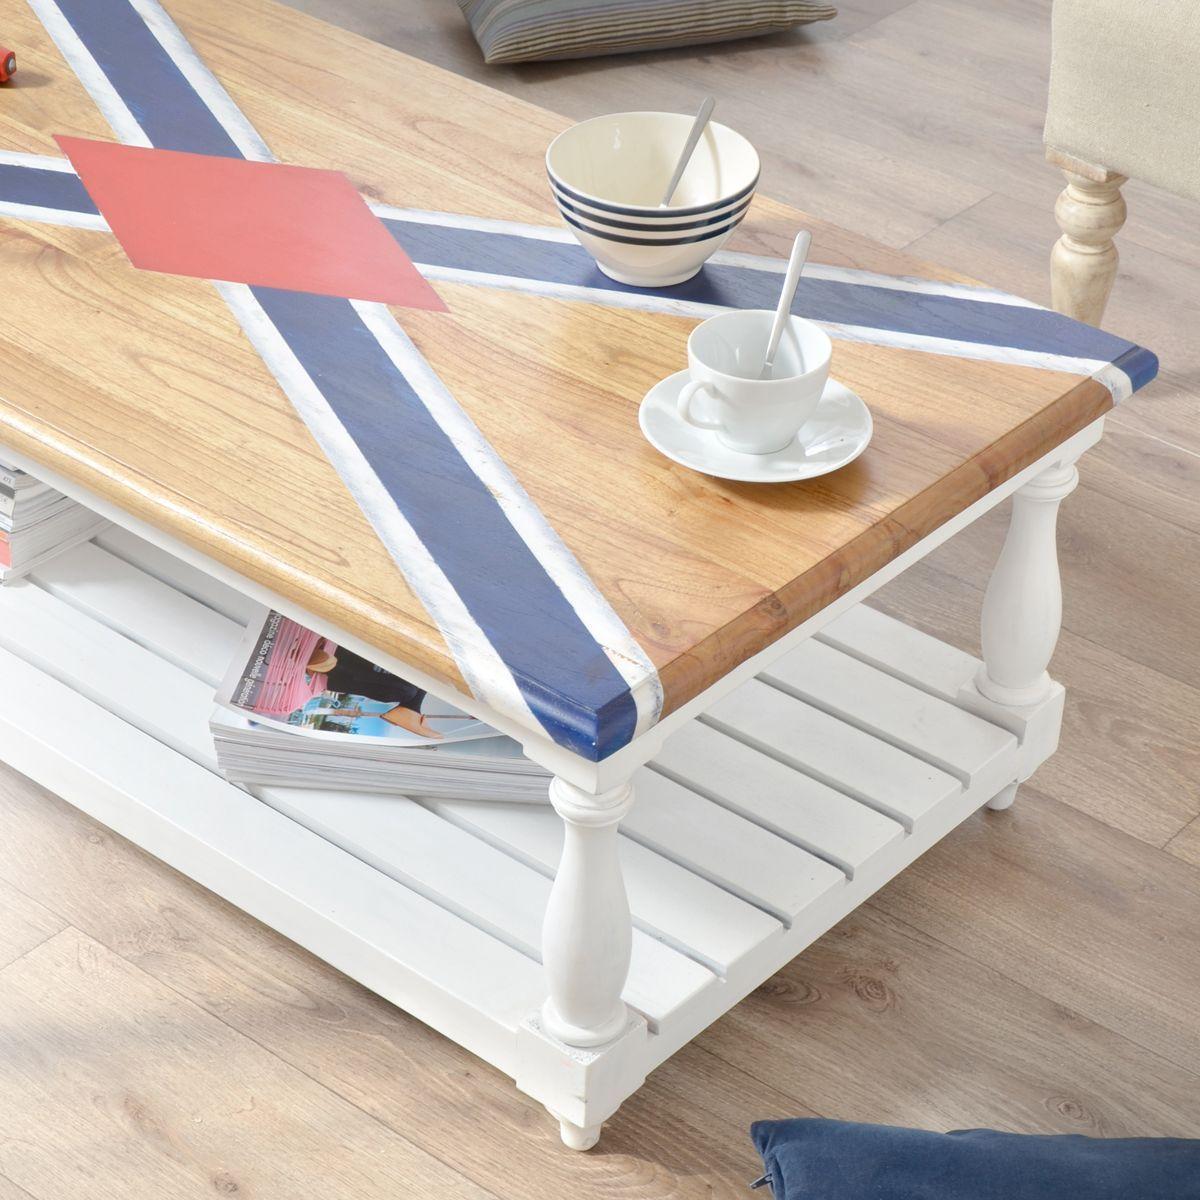 Table Basse En Pin Repeinte En Blanc Rayures Et Plateau